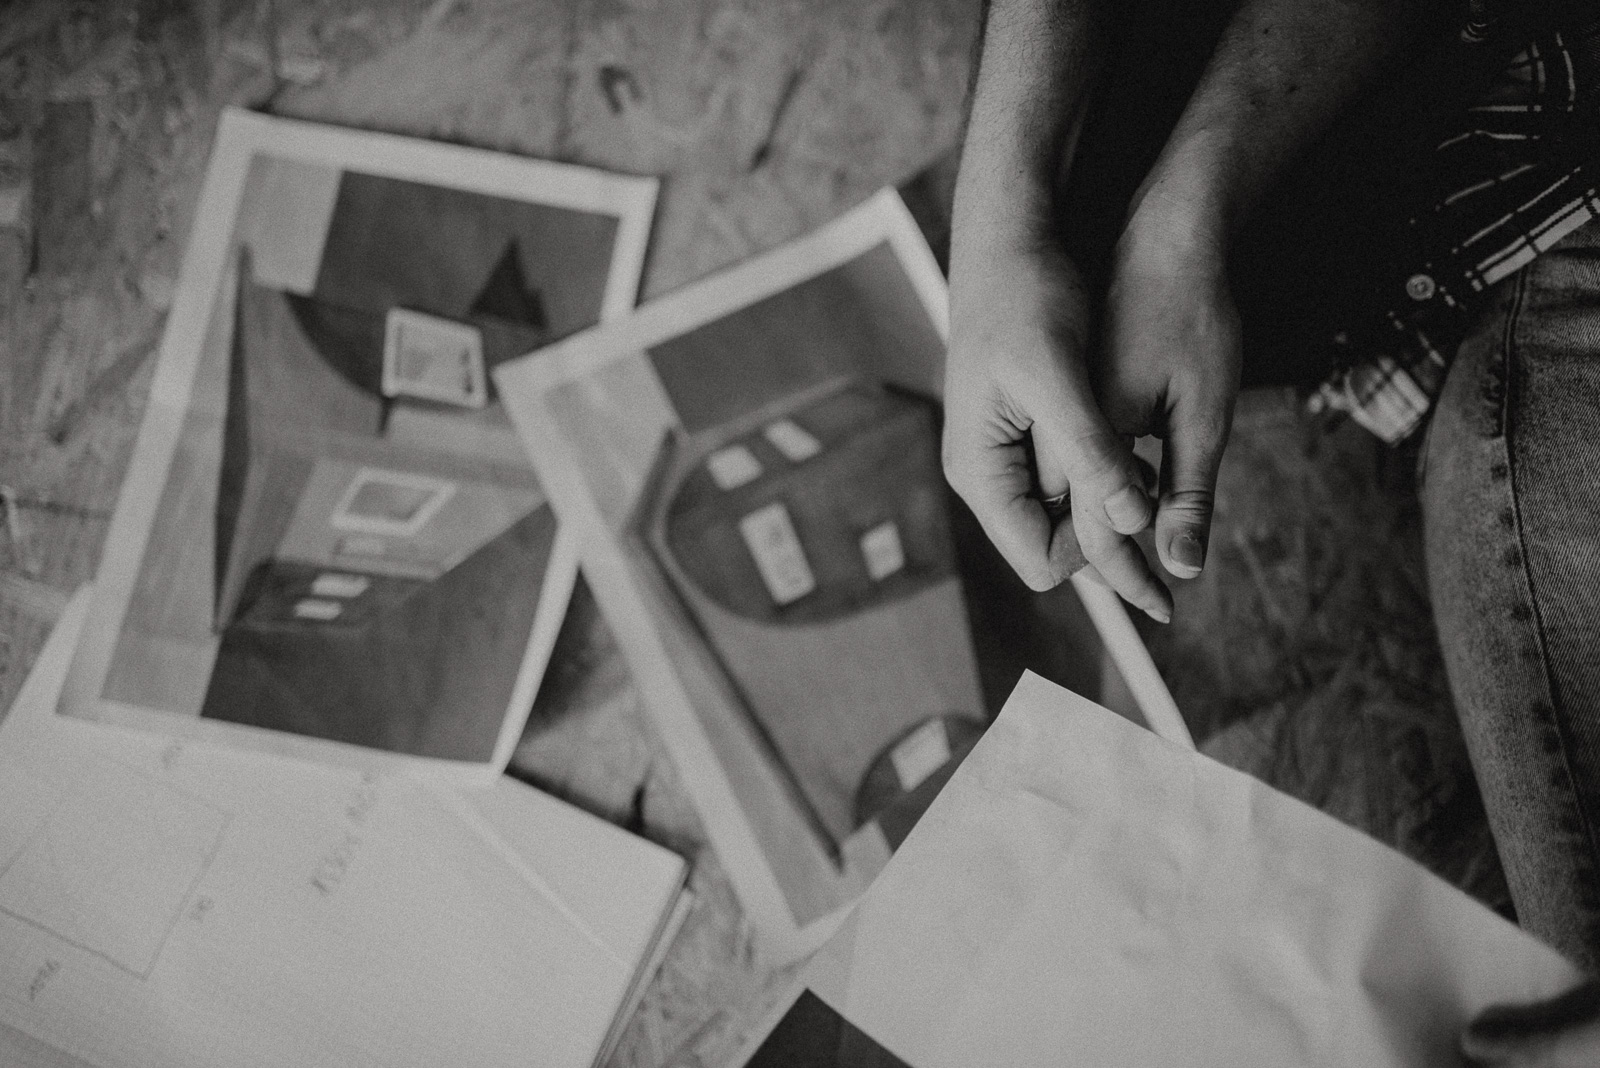 040-dokumentarische-fotografie-tinyhouse-ecochalet-fotografin-witten